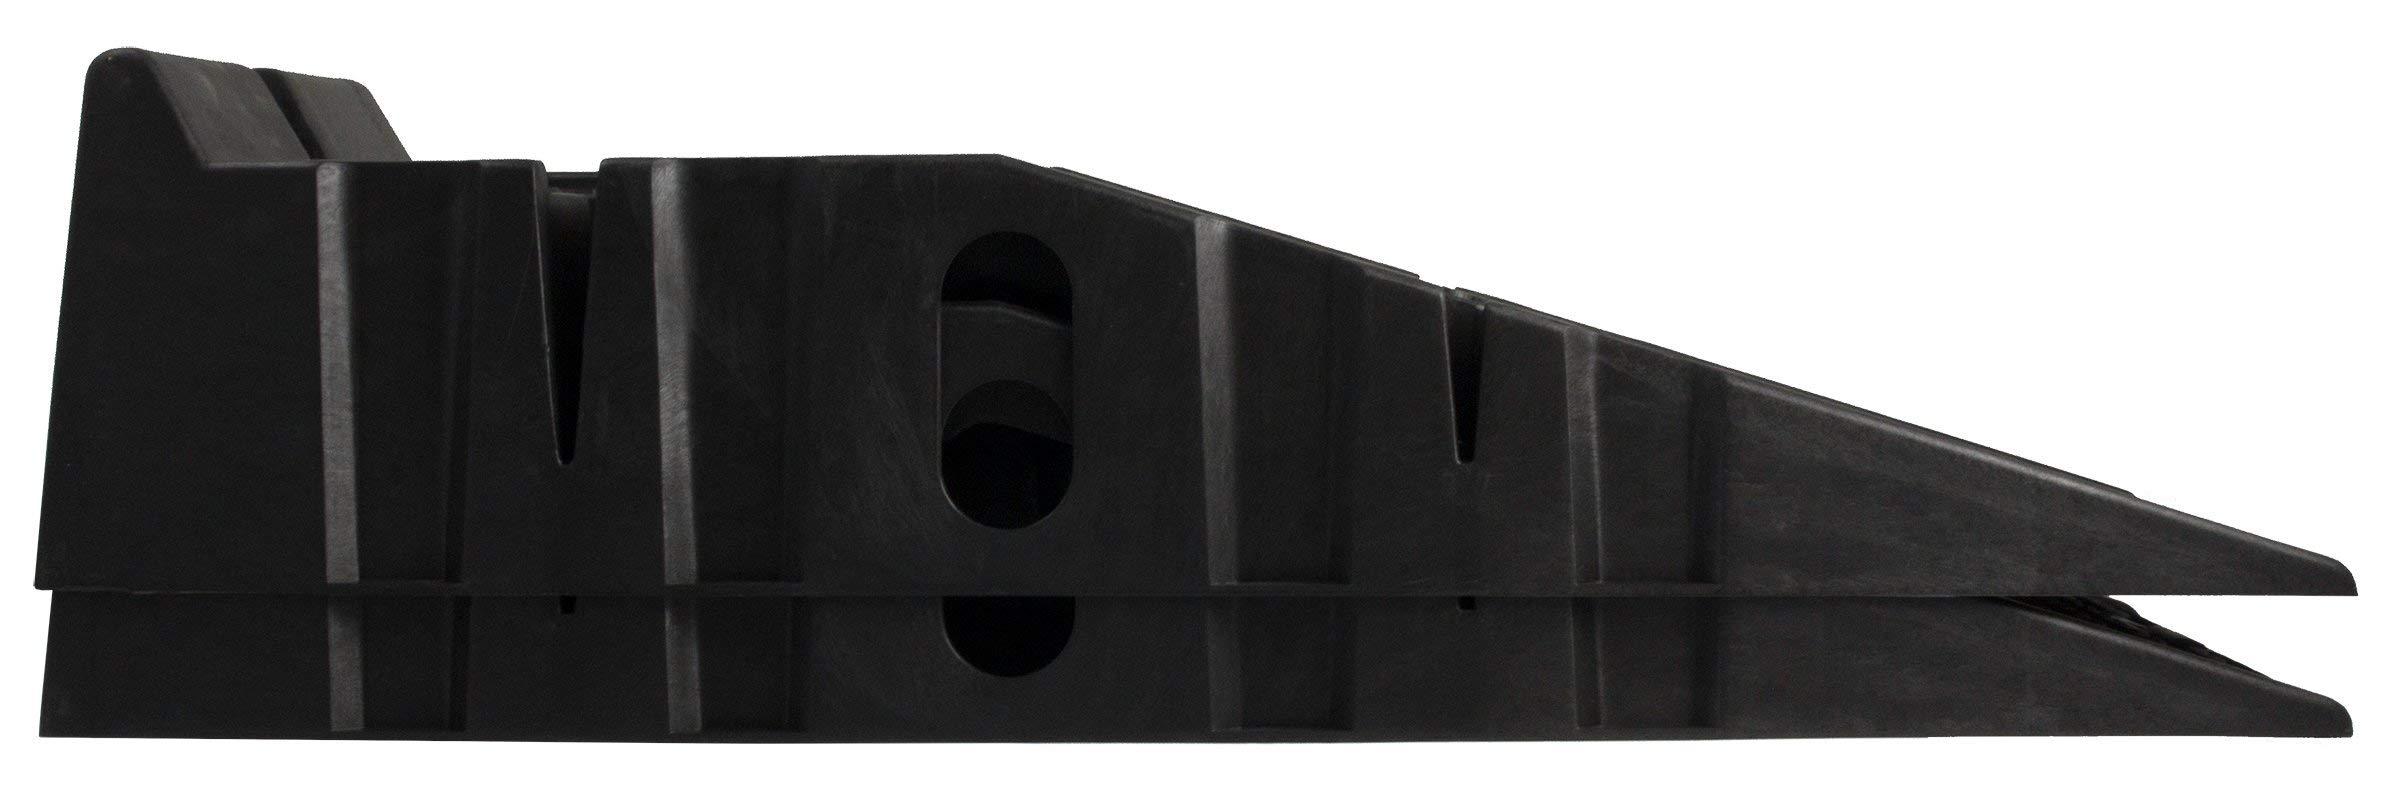 RhinoGear 11912 RhinoRamps MAX Vehicle Ramps - Set of 2 (16,000lb. GVW Capacity) (Renewed) by RhinoGear (Image #7)